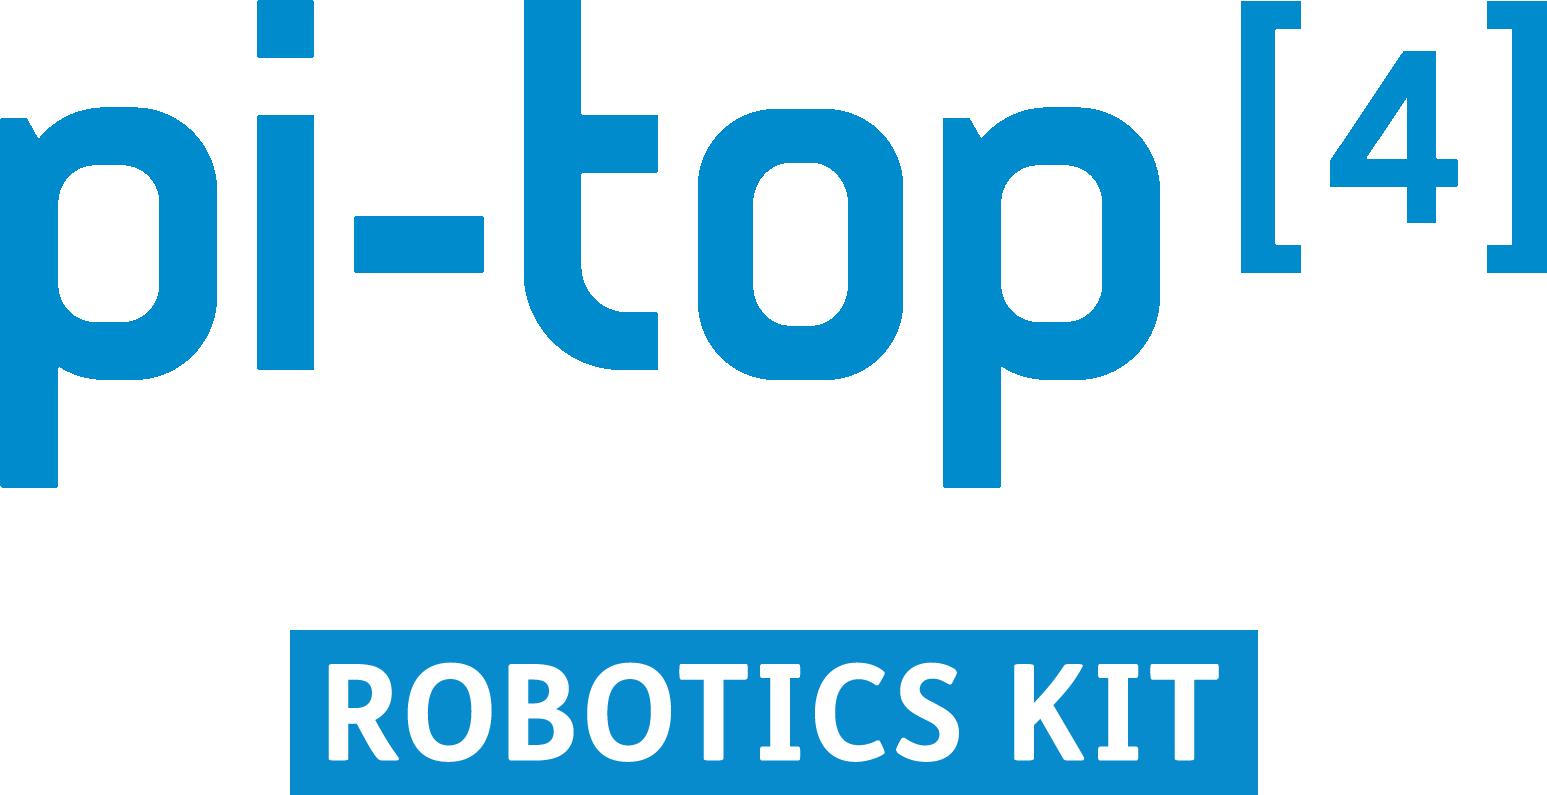 RoboticsKit